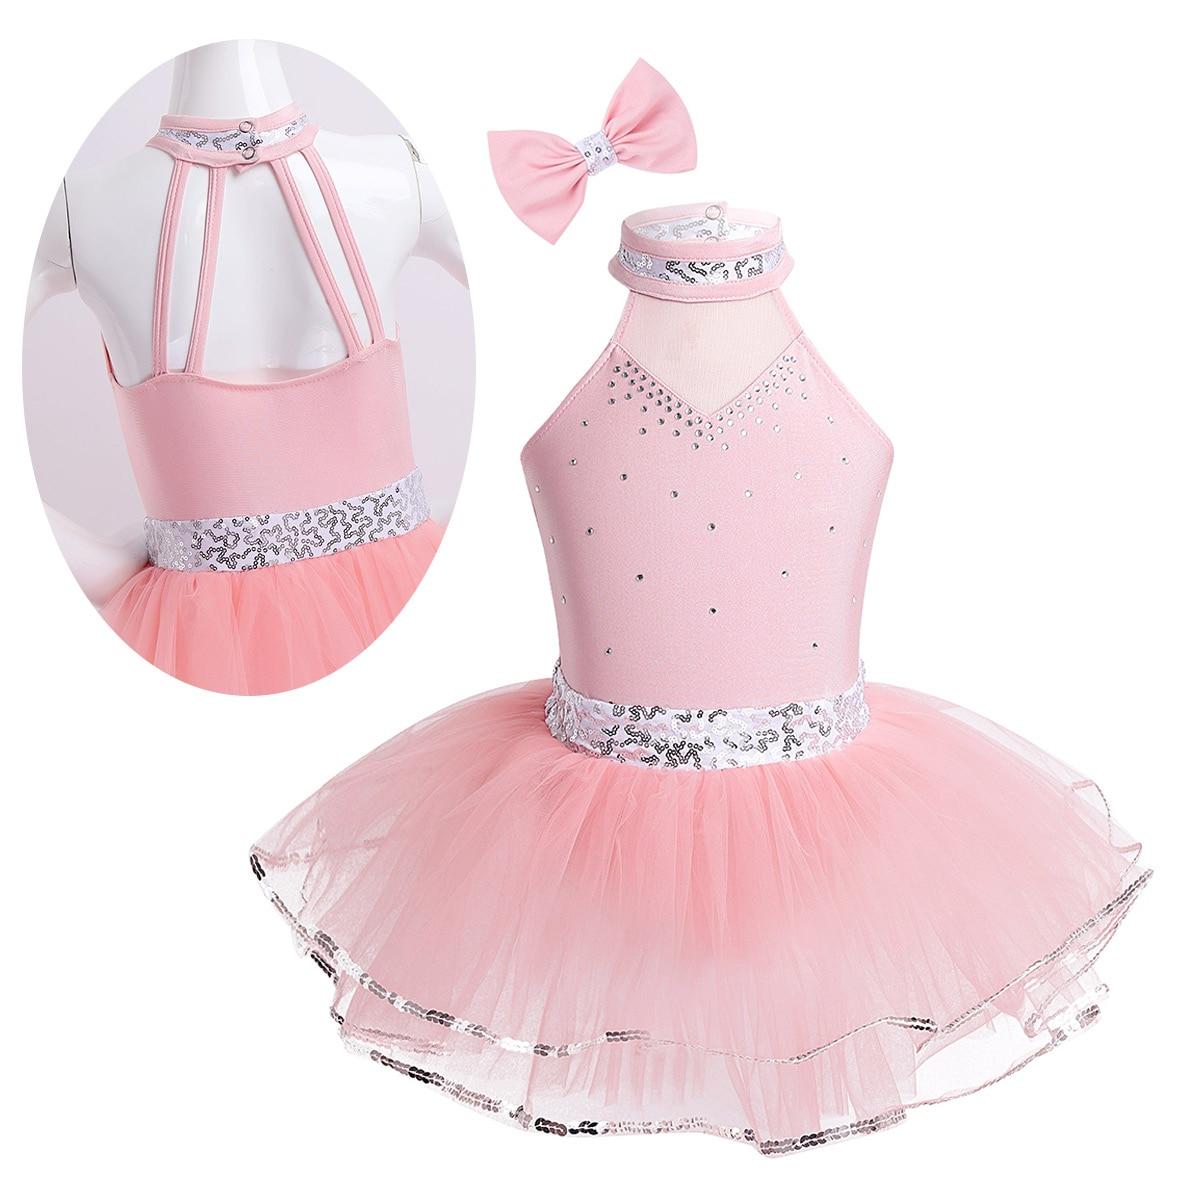 Children Kids Girls Ballet Tutu Professional Halter Sparkly Ballet Child Girls Ballet Dress Ballet For Costumes Balarina Party